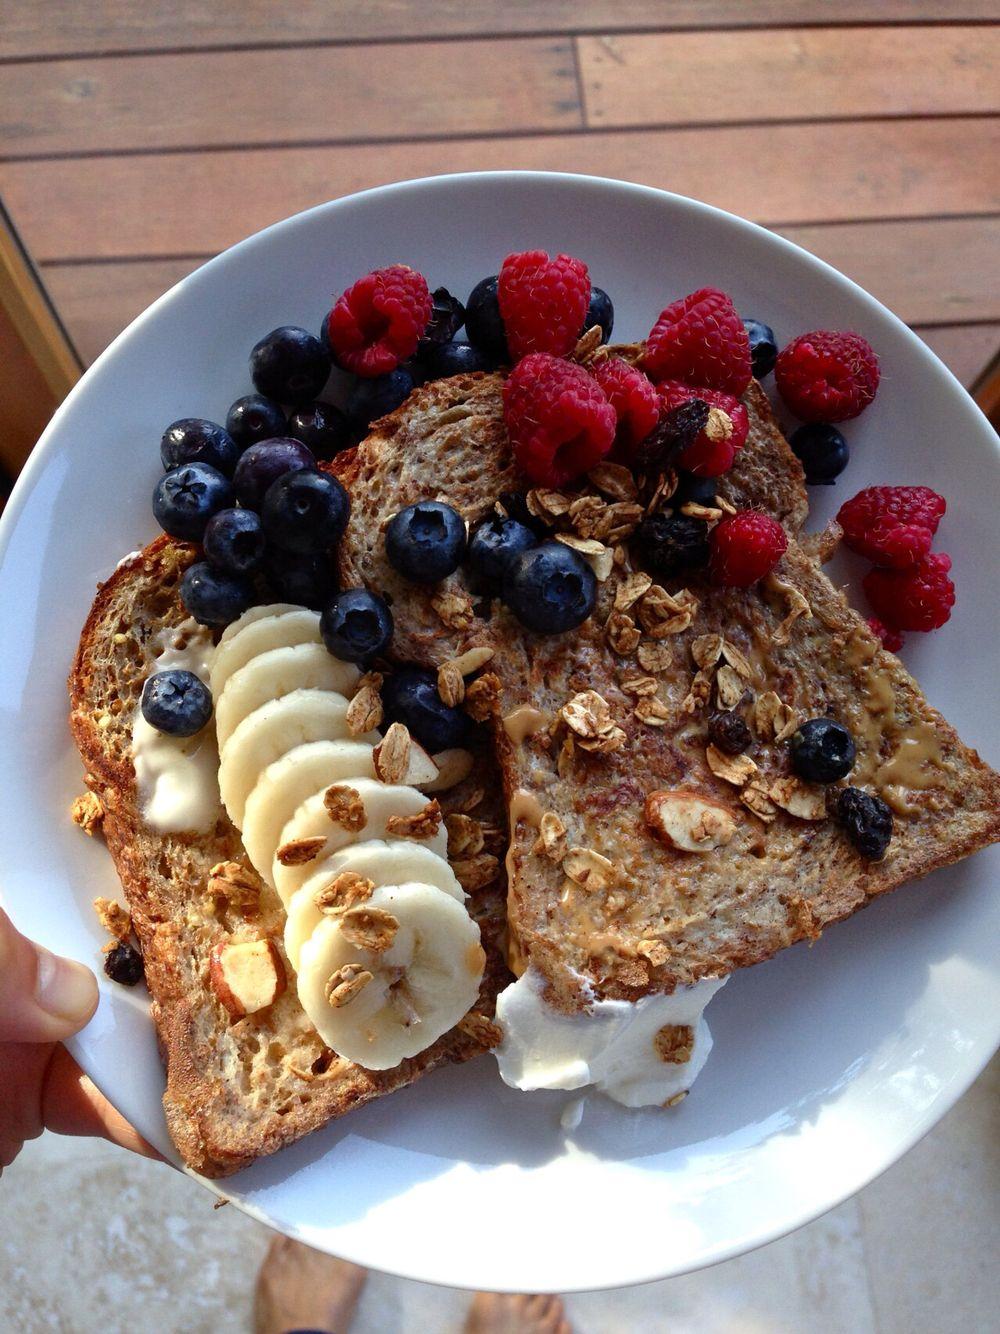 Whole Grain Toast With Yogurt Granola Banana Slices And Berries For Breakfast